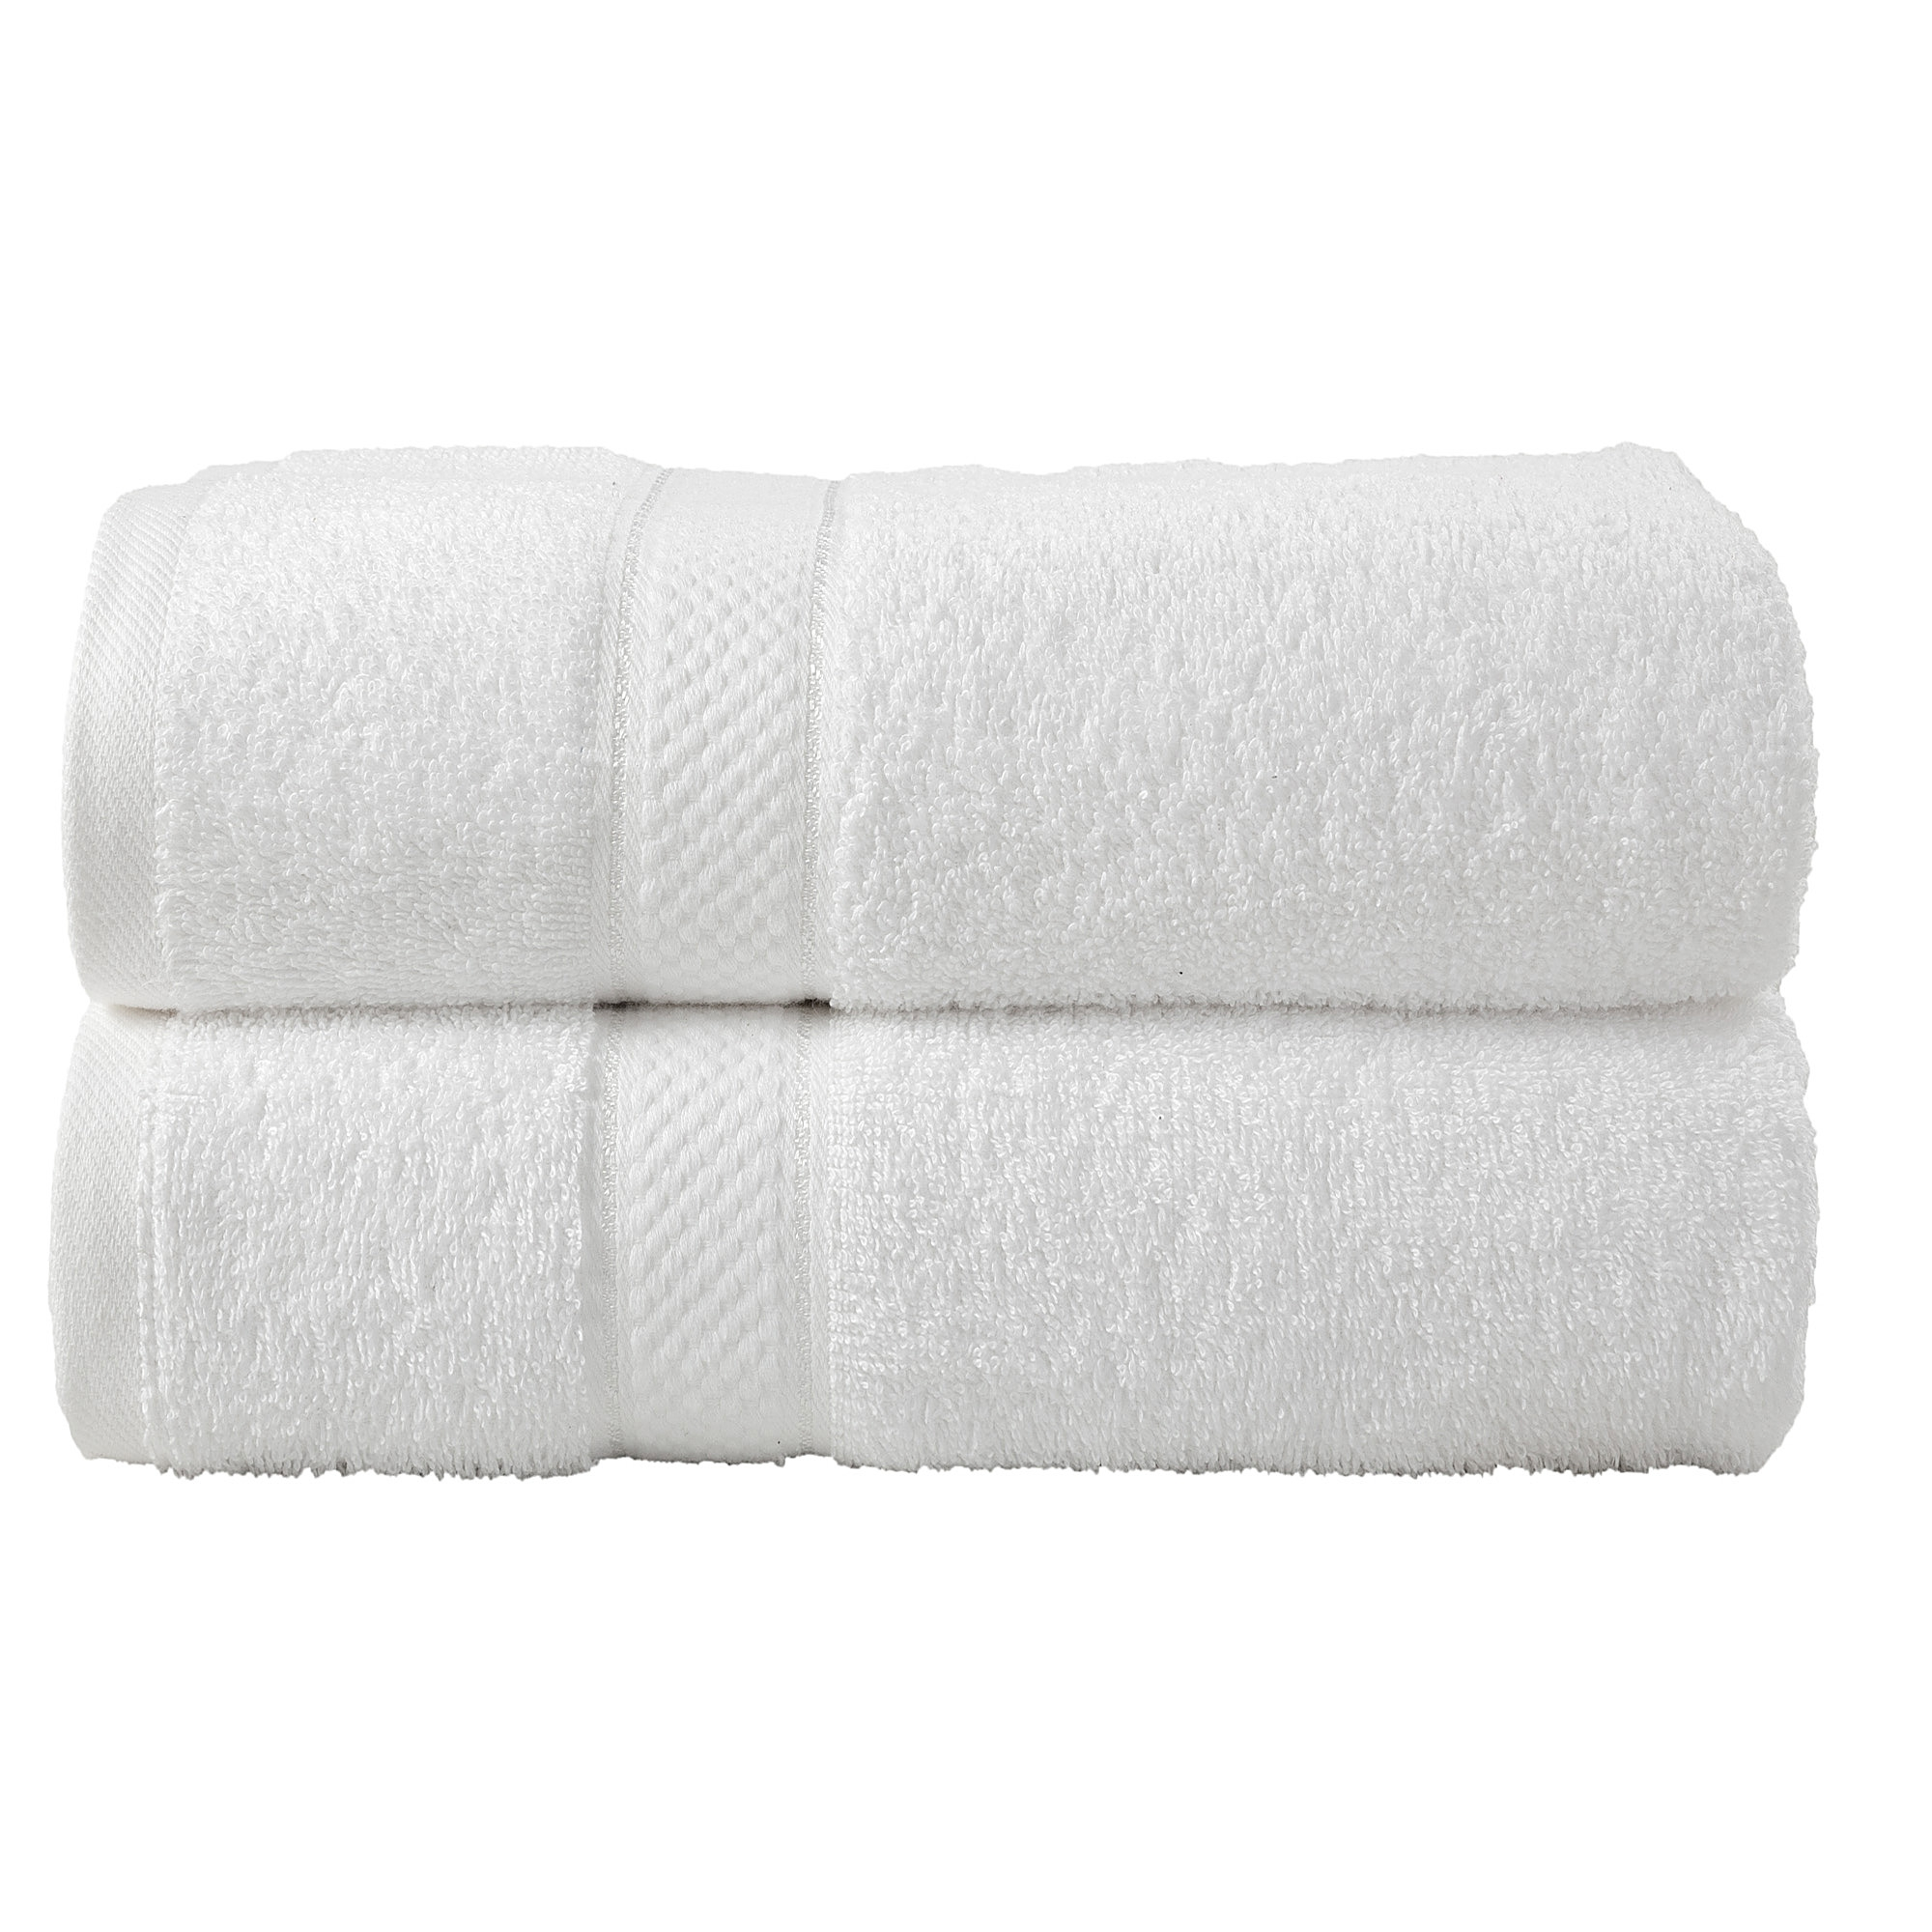 2 Pcs Bath Cotton Towel Bale Set White Plain